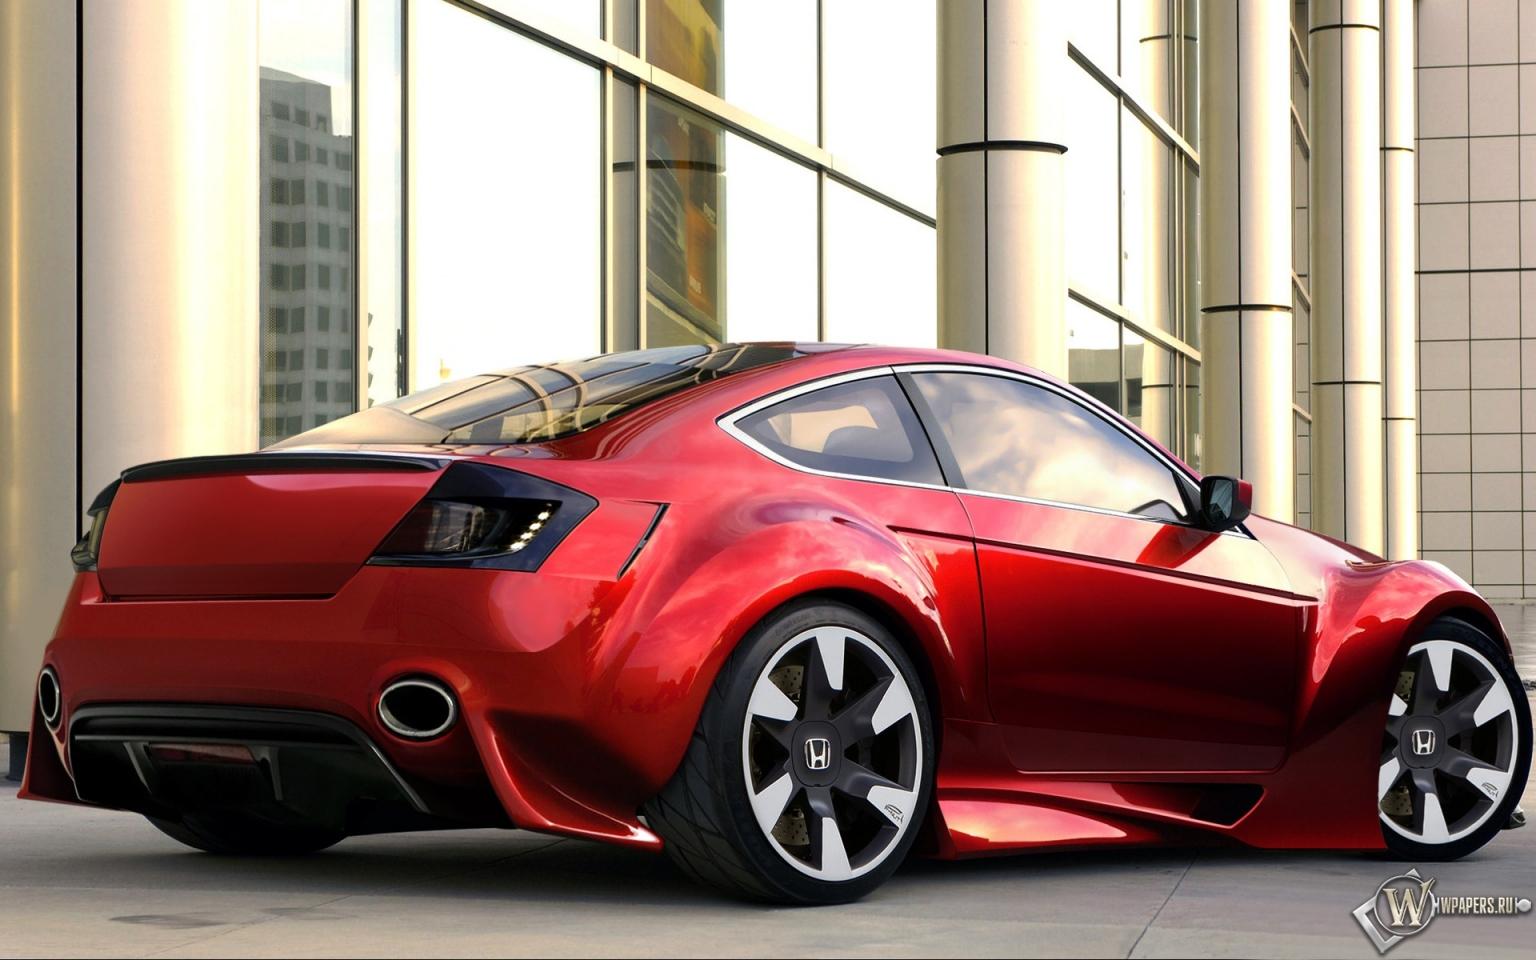 Хонда Аккорд Купэ 1536x960